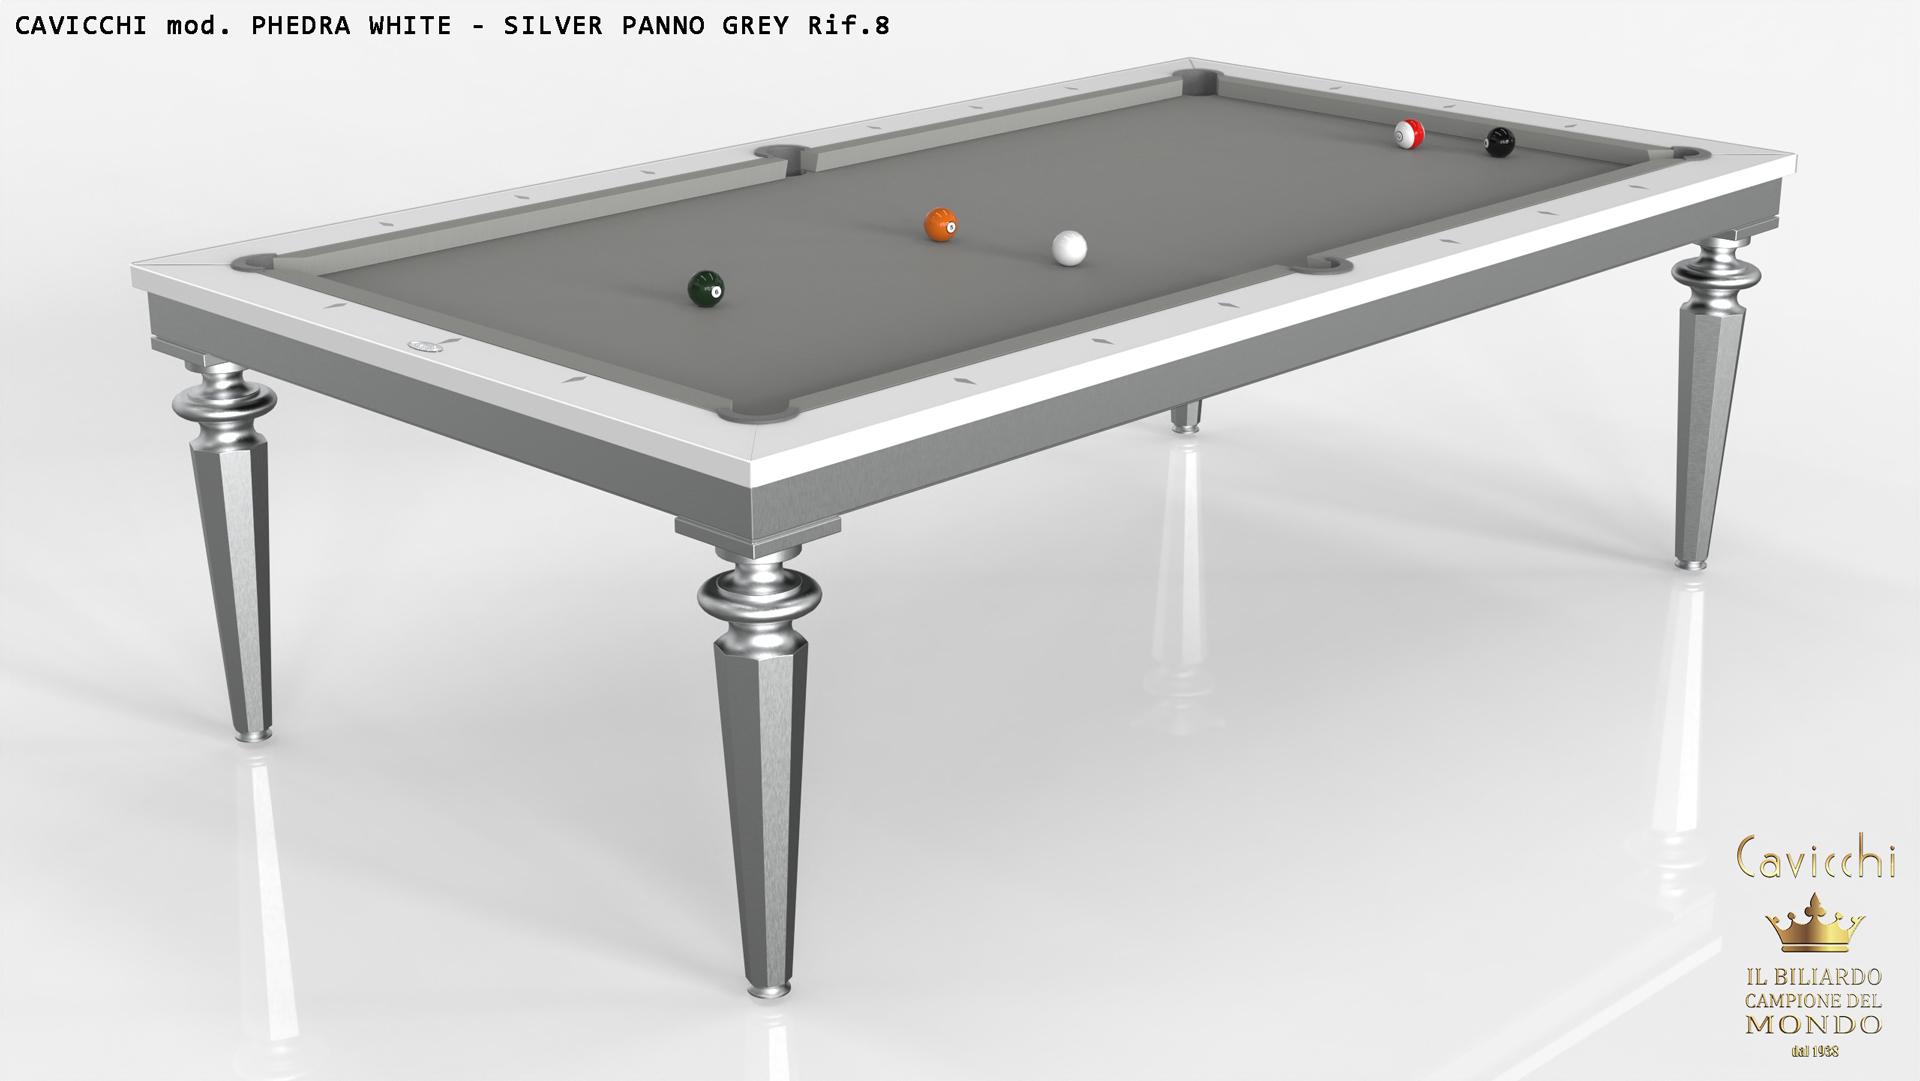 Бильярдный стол Cavicchi PHEDRA WHITE 6